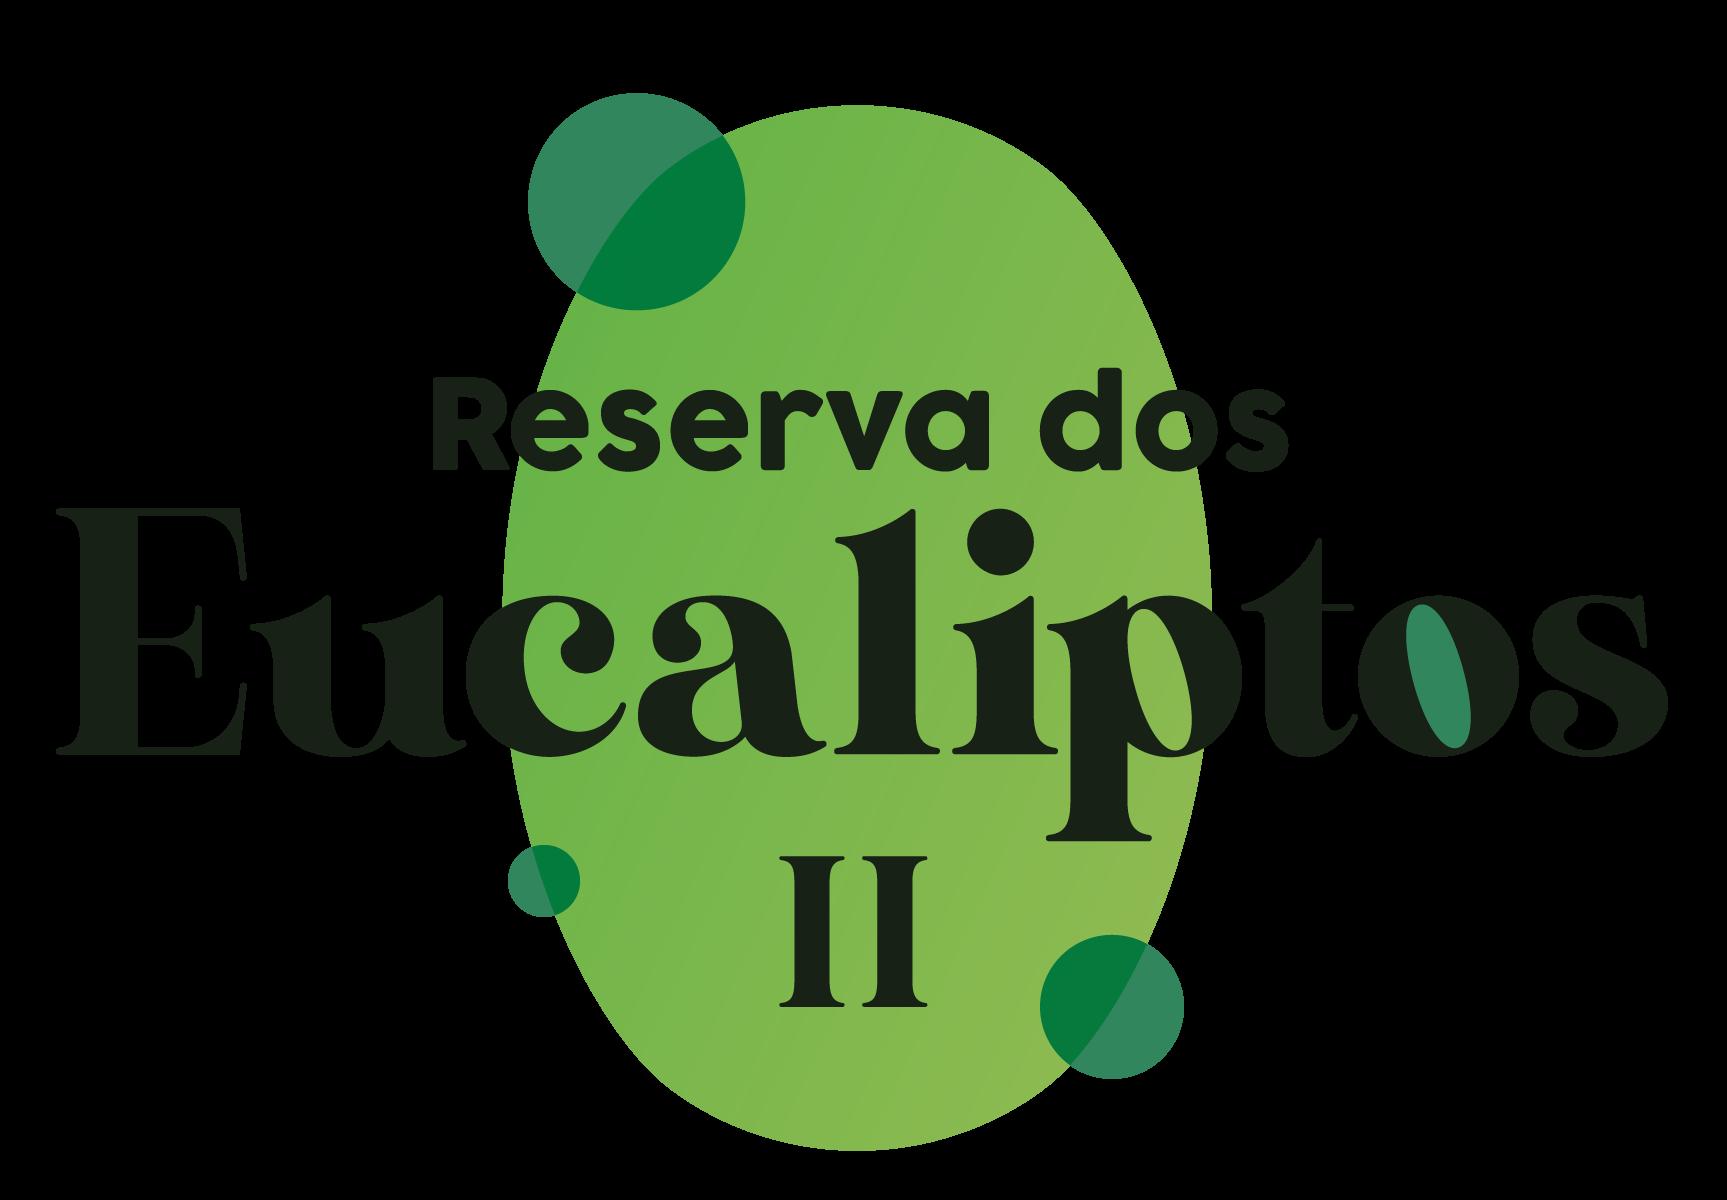 Logotipo Empreendimento Reserva dos Eucaliptos II | Apartamentos à venda | Tenda.com.br